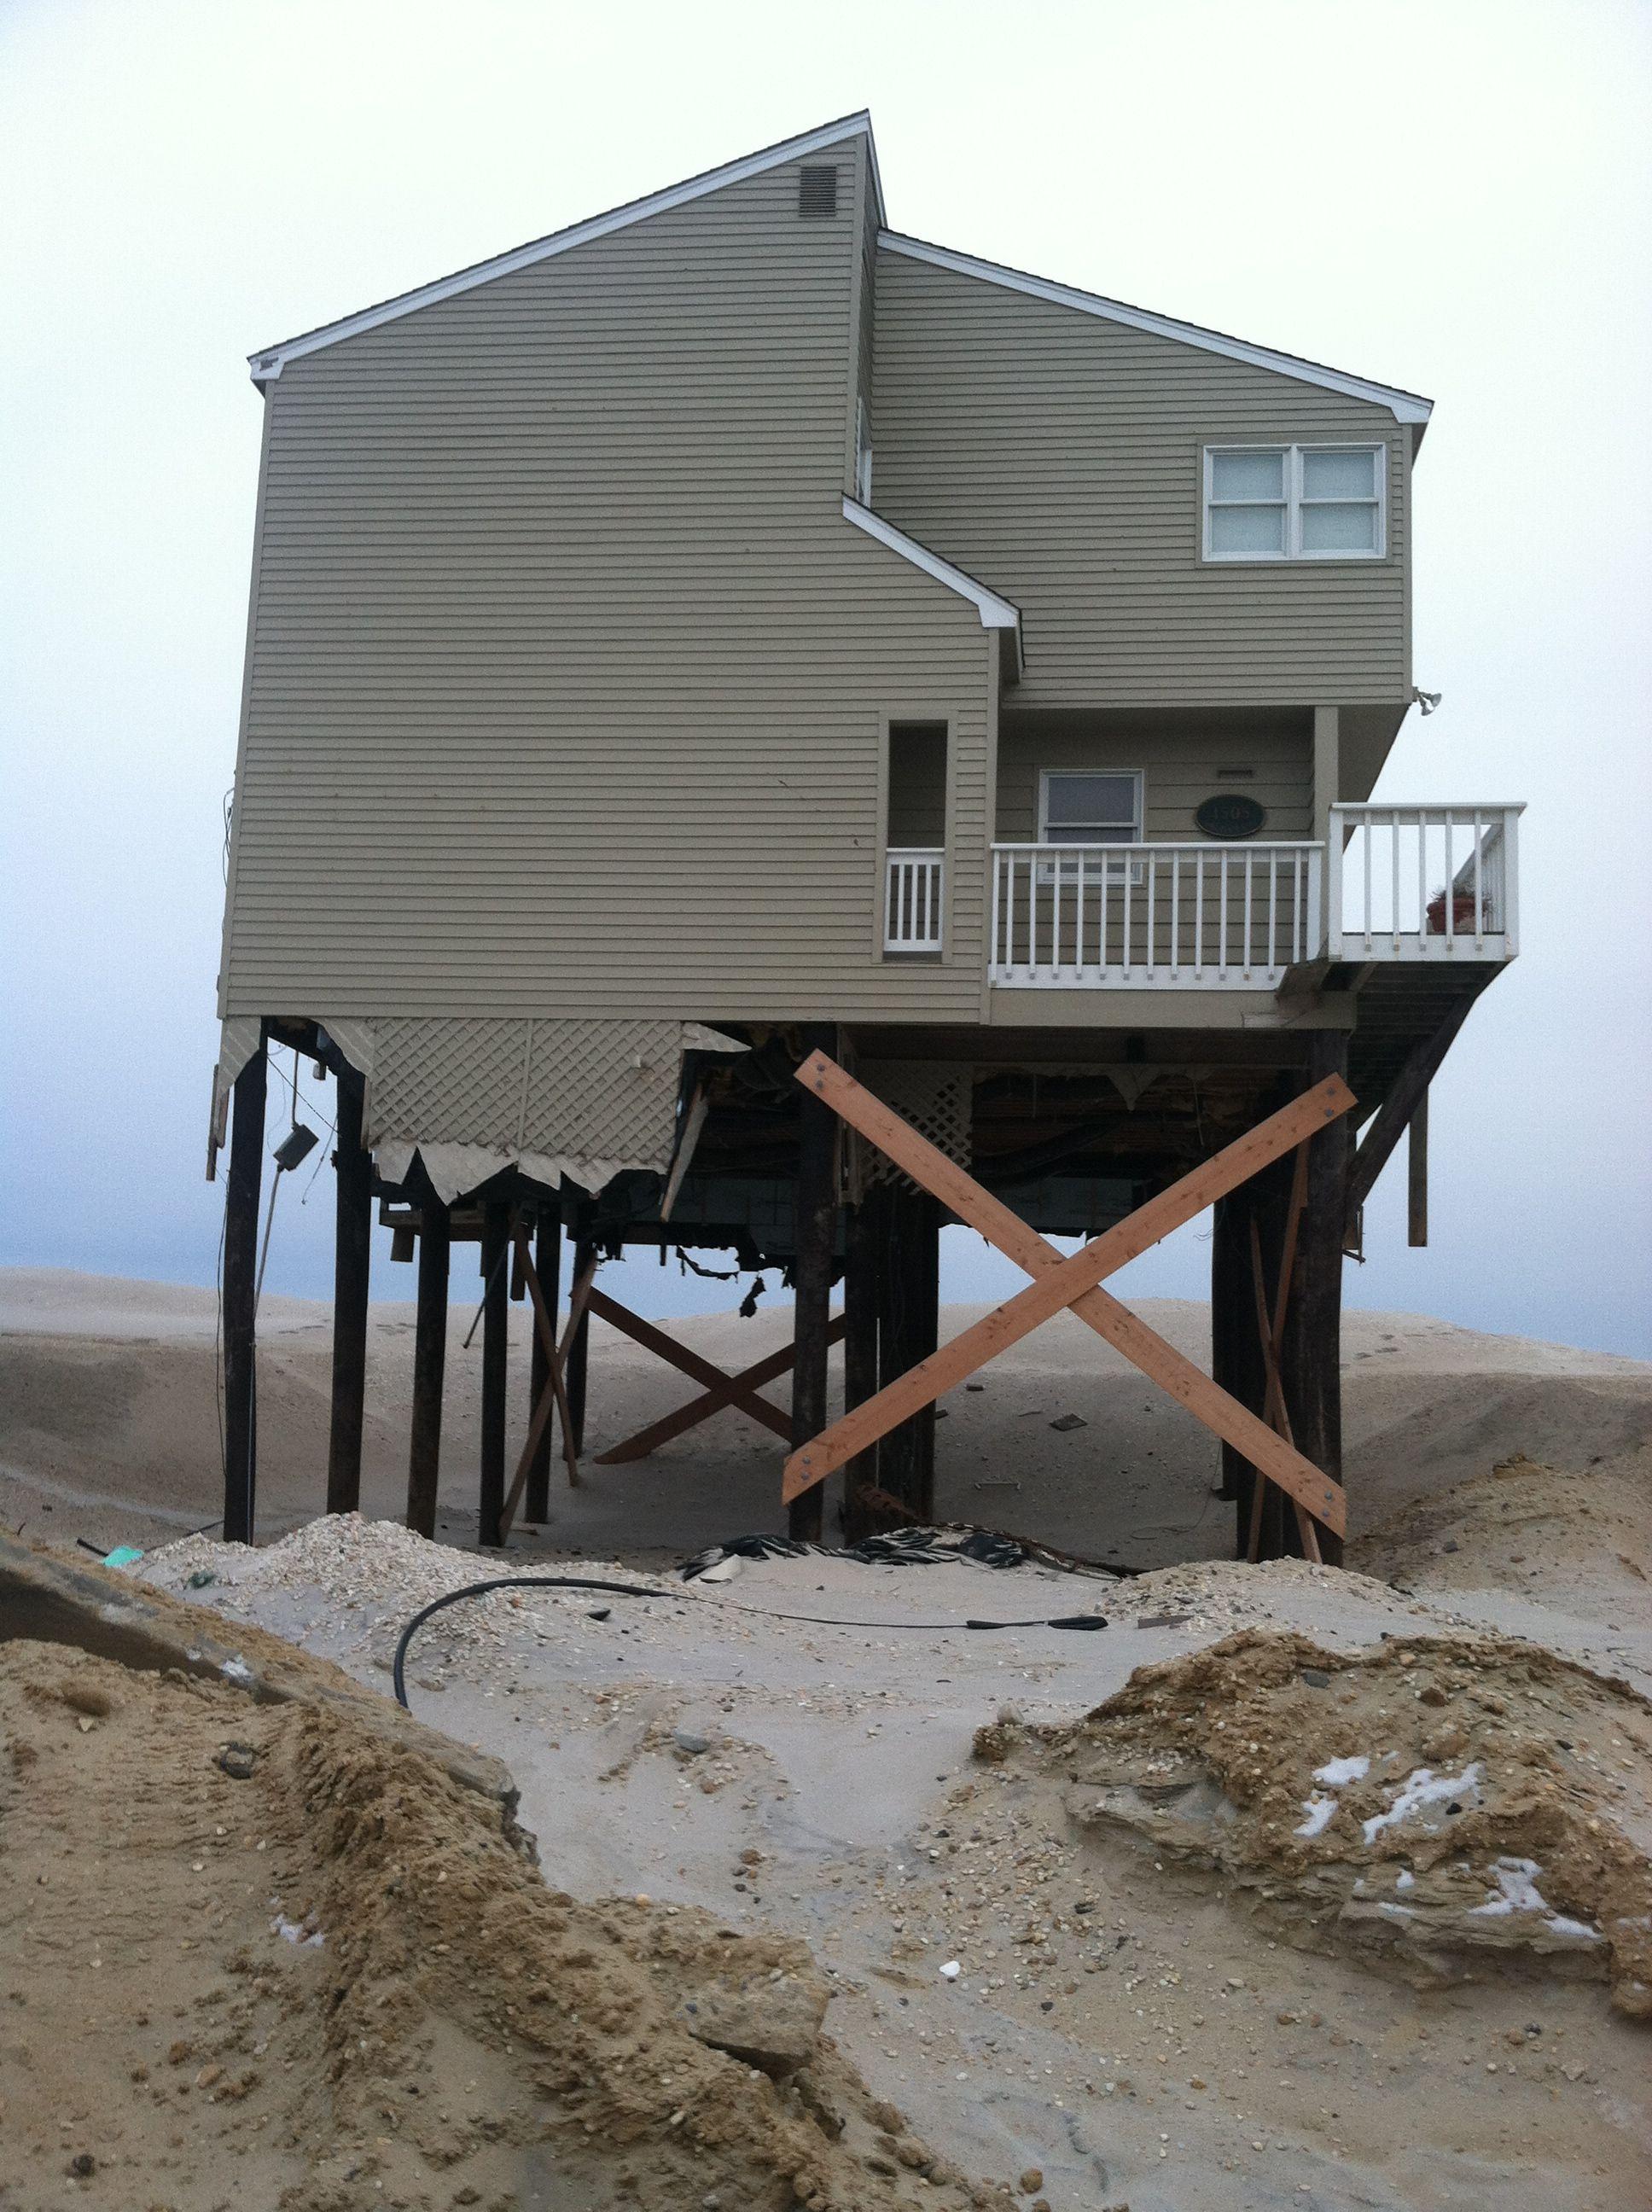 Aftermath Of Hurricane Sandy Holgate Long Beach Island Nj Long Beach Island Hurricane Sandy Barnegat Lighthouse